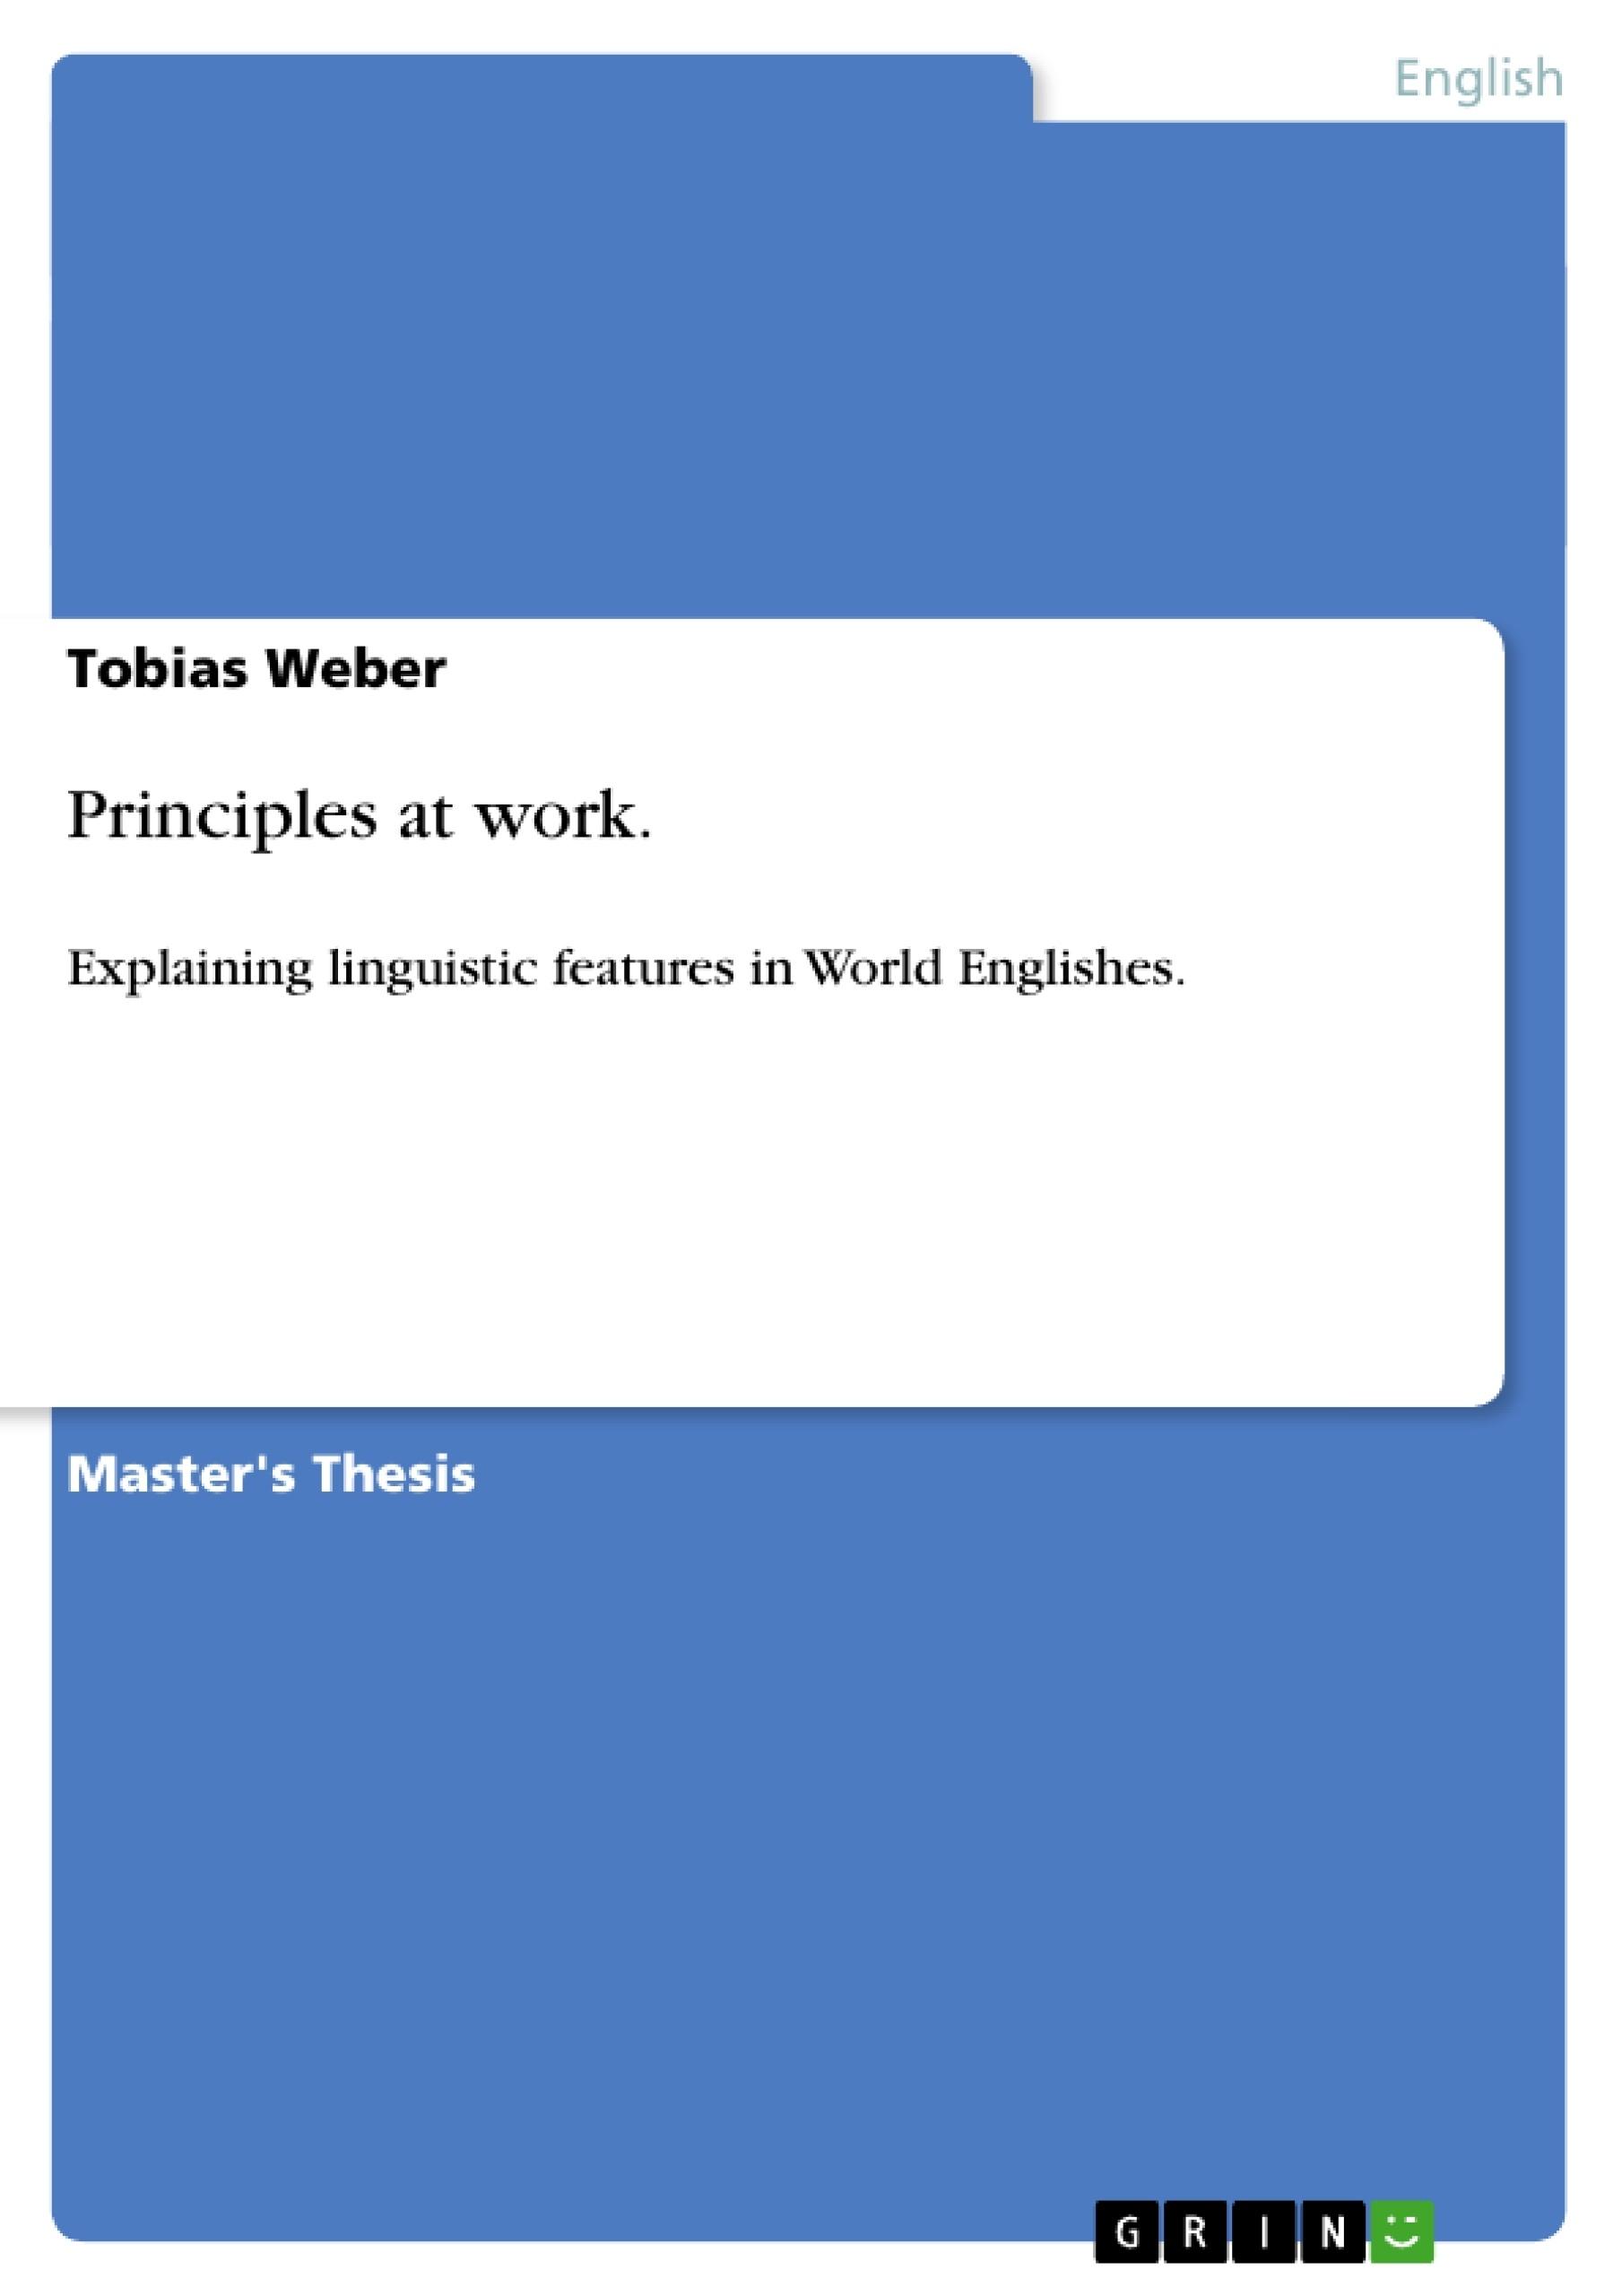 Title: Principles at work.